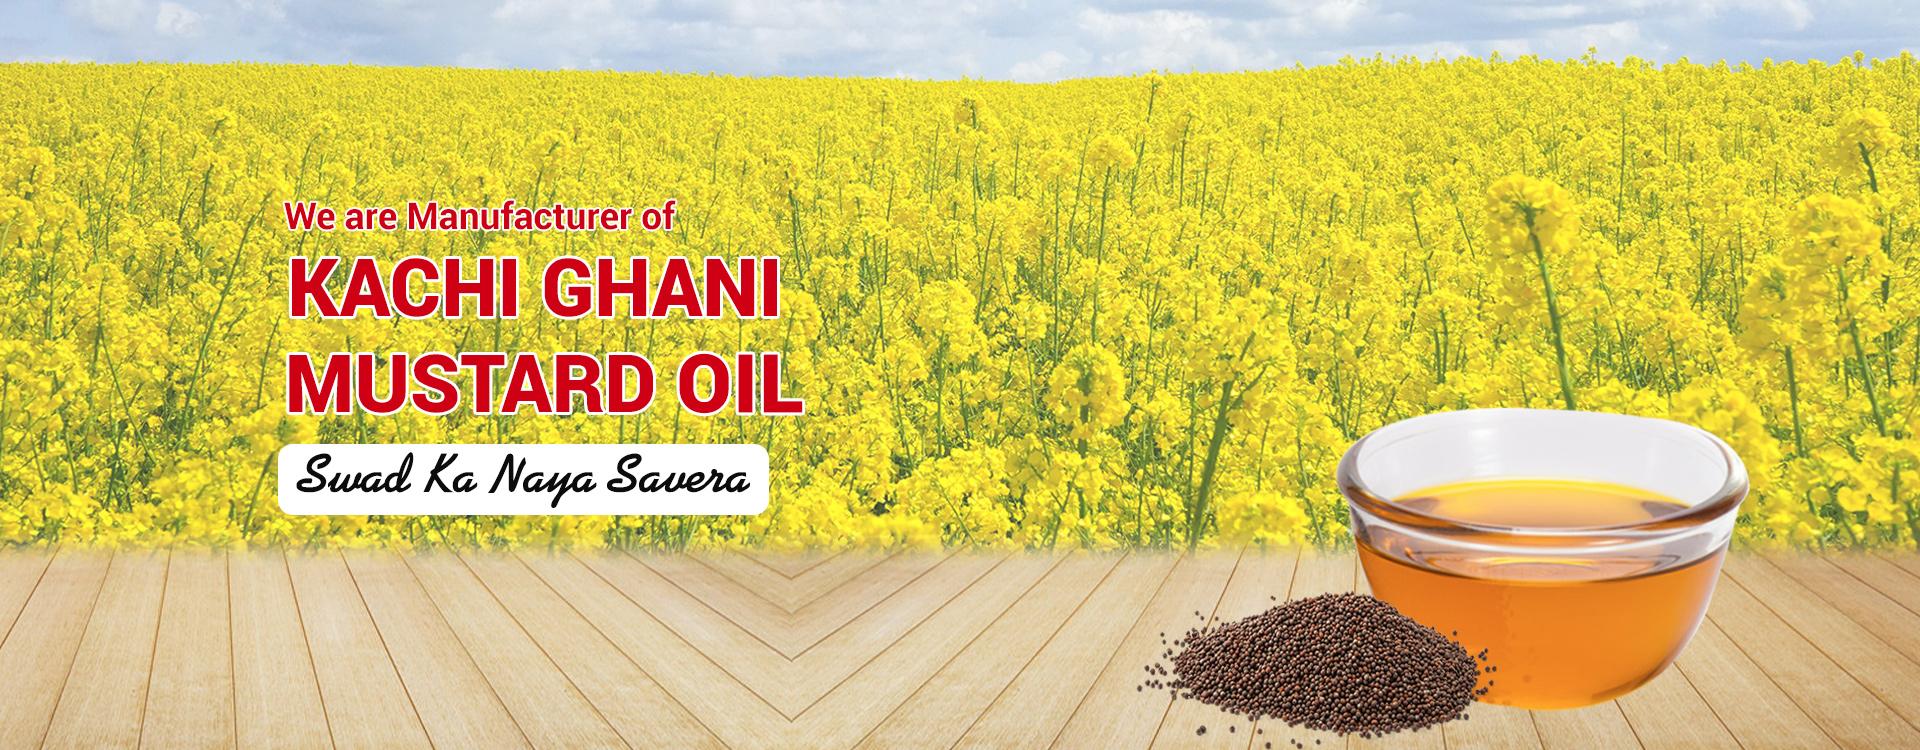 Kachi Ghani Mustard Oil, Cooking Oil Supplier